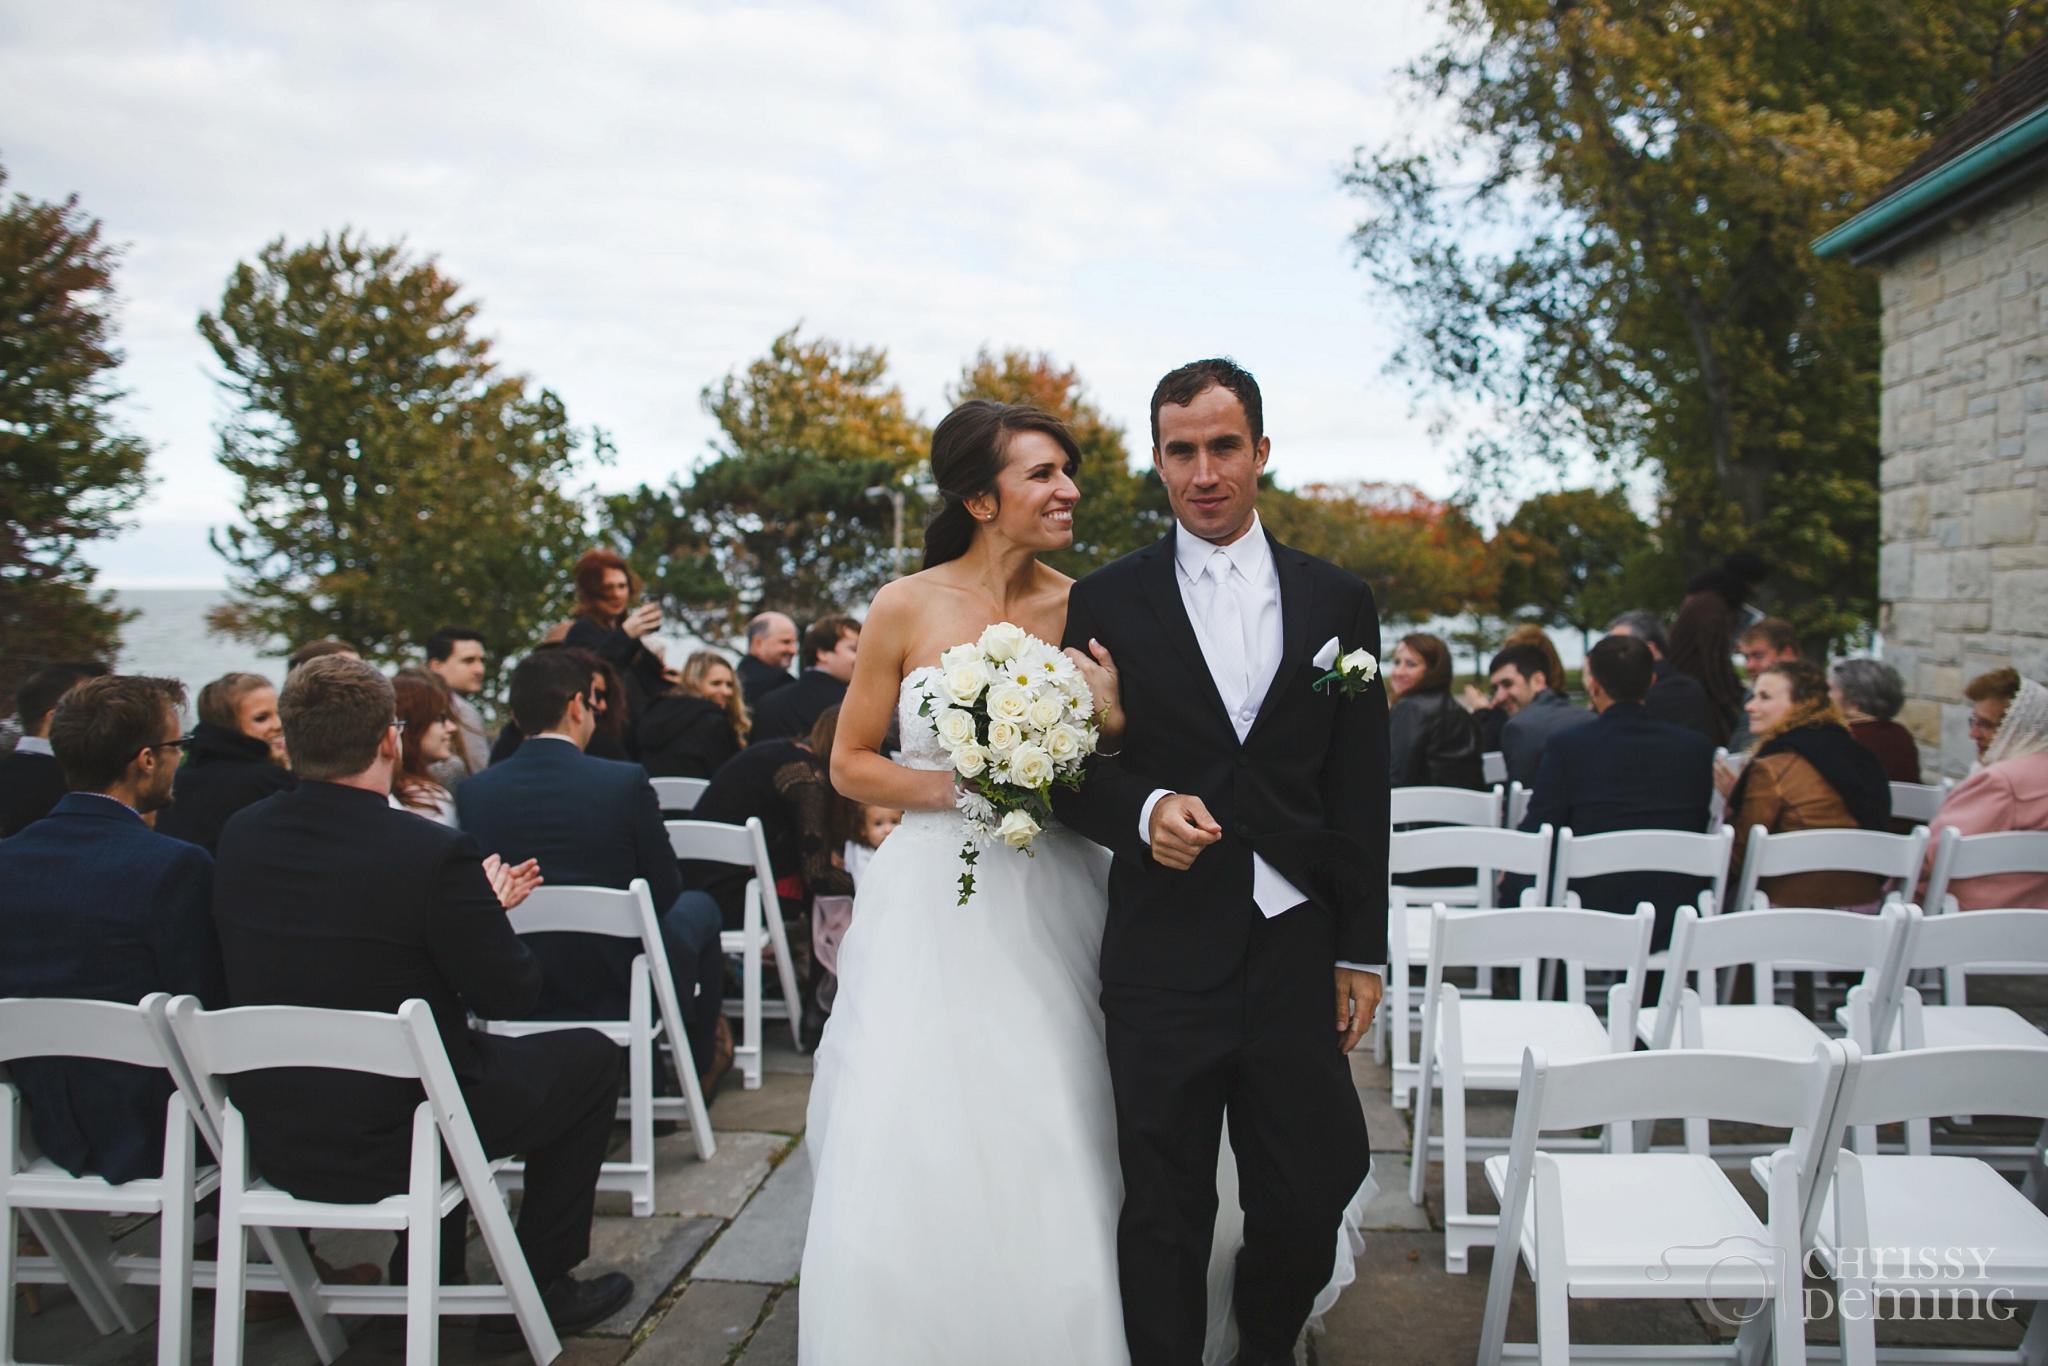 promontory_point_chicago_wedding_photography_0017.jpg